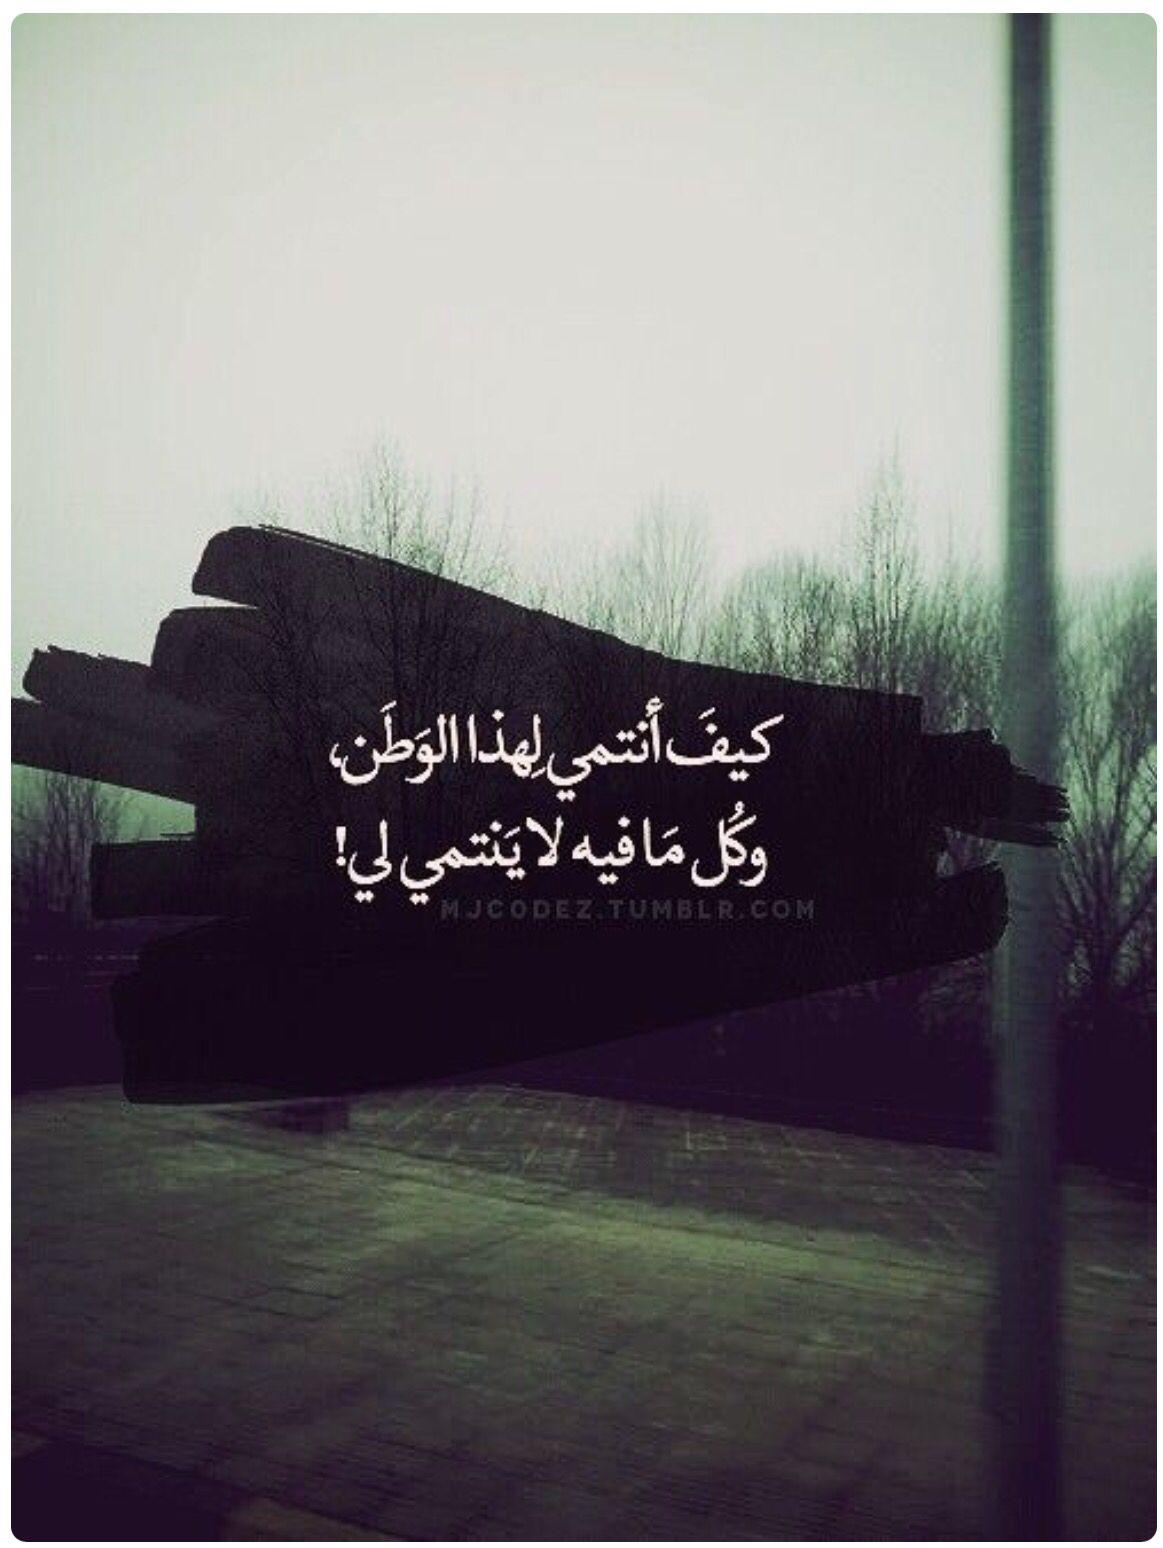 كيف انتمي لهذا المجتمع وكل مافيه يرفضني Arabic Quotes Arabic Love Quotes Life Quotes In English